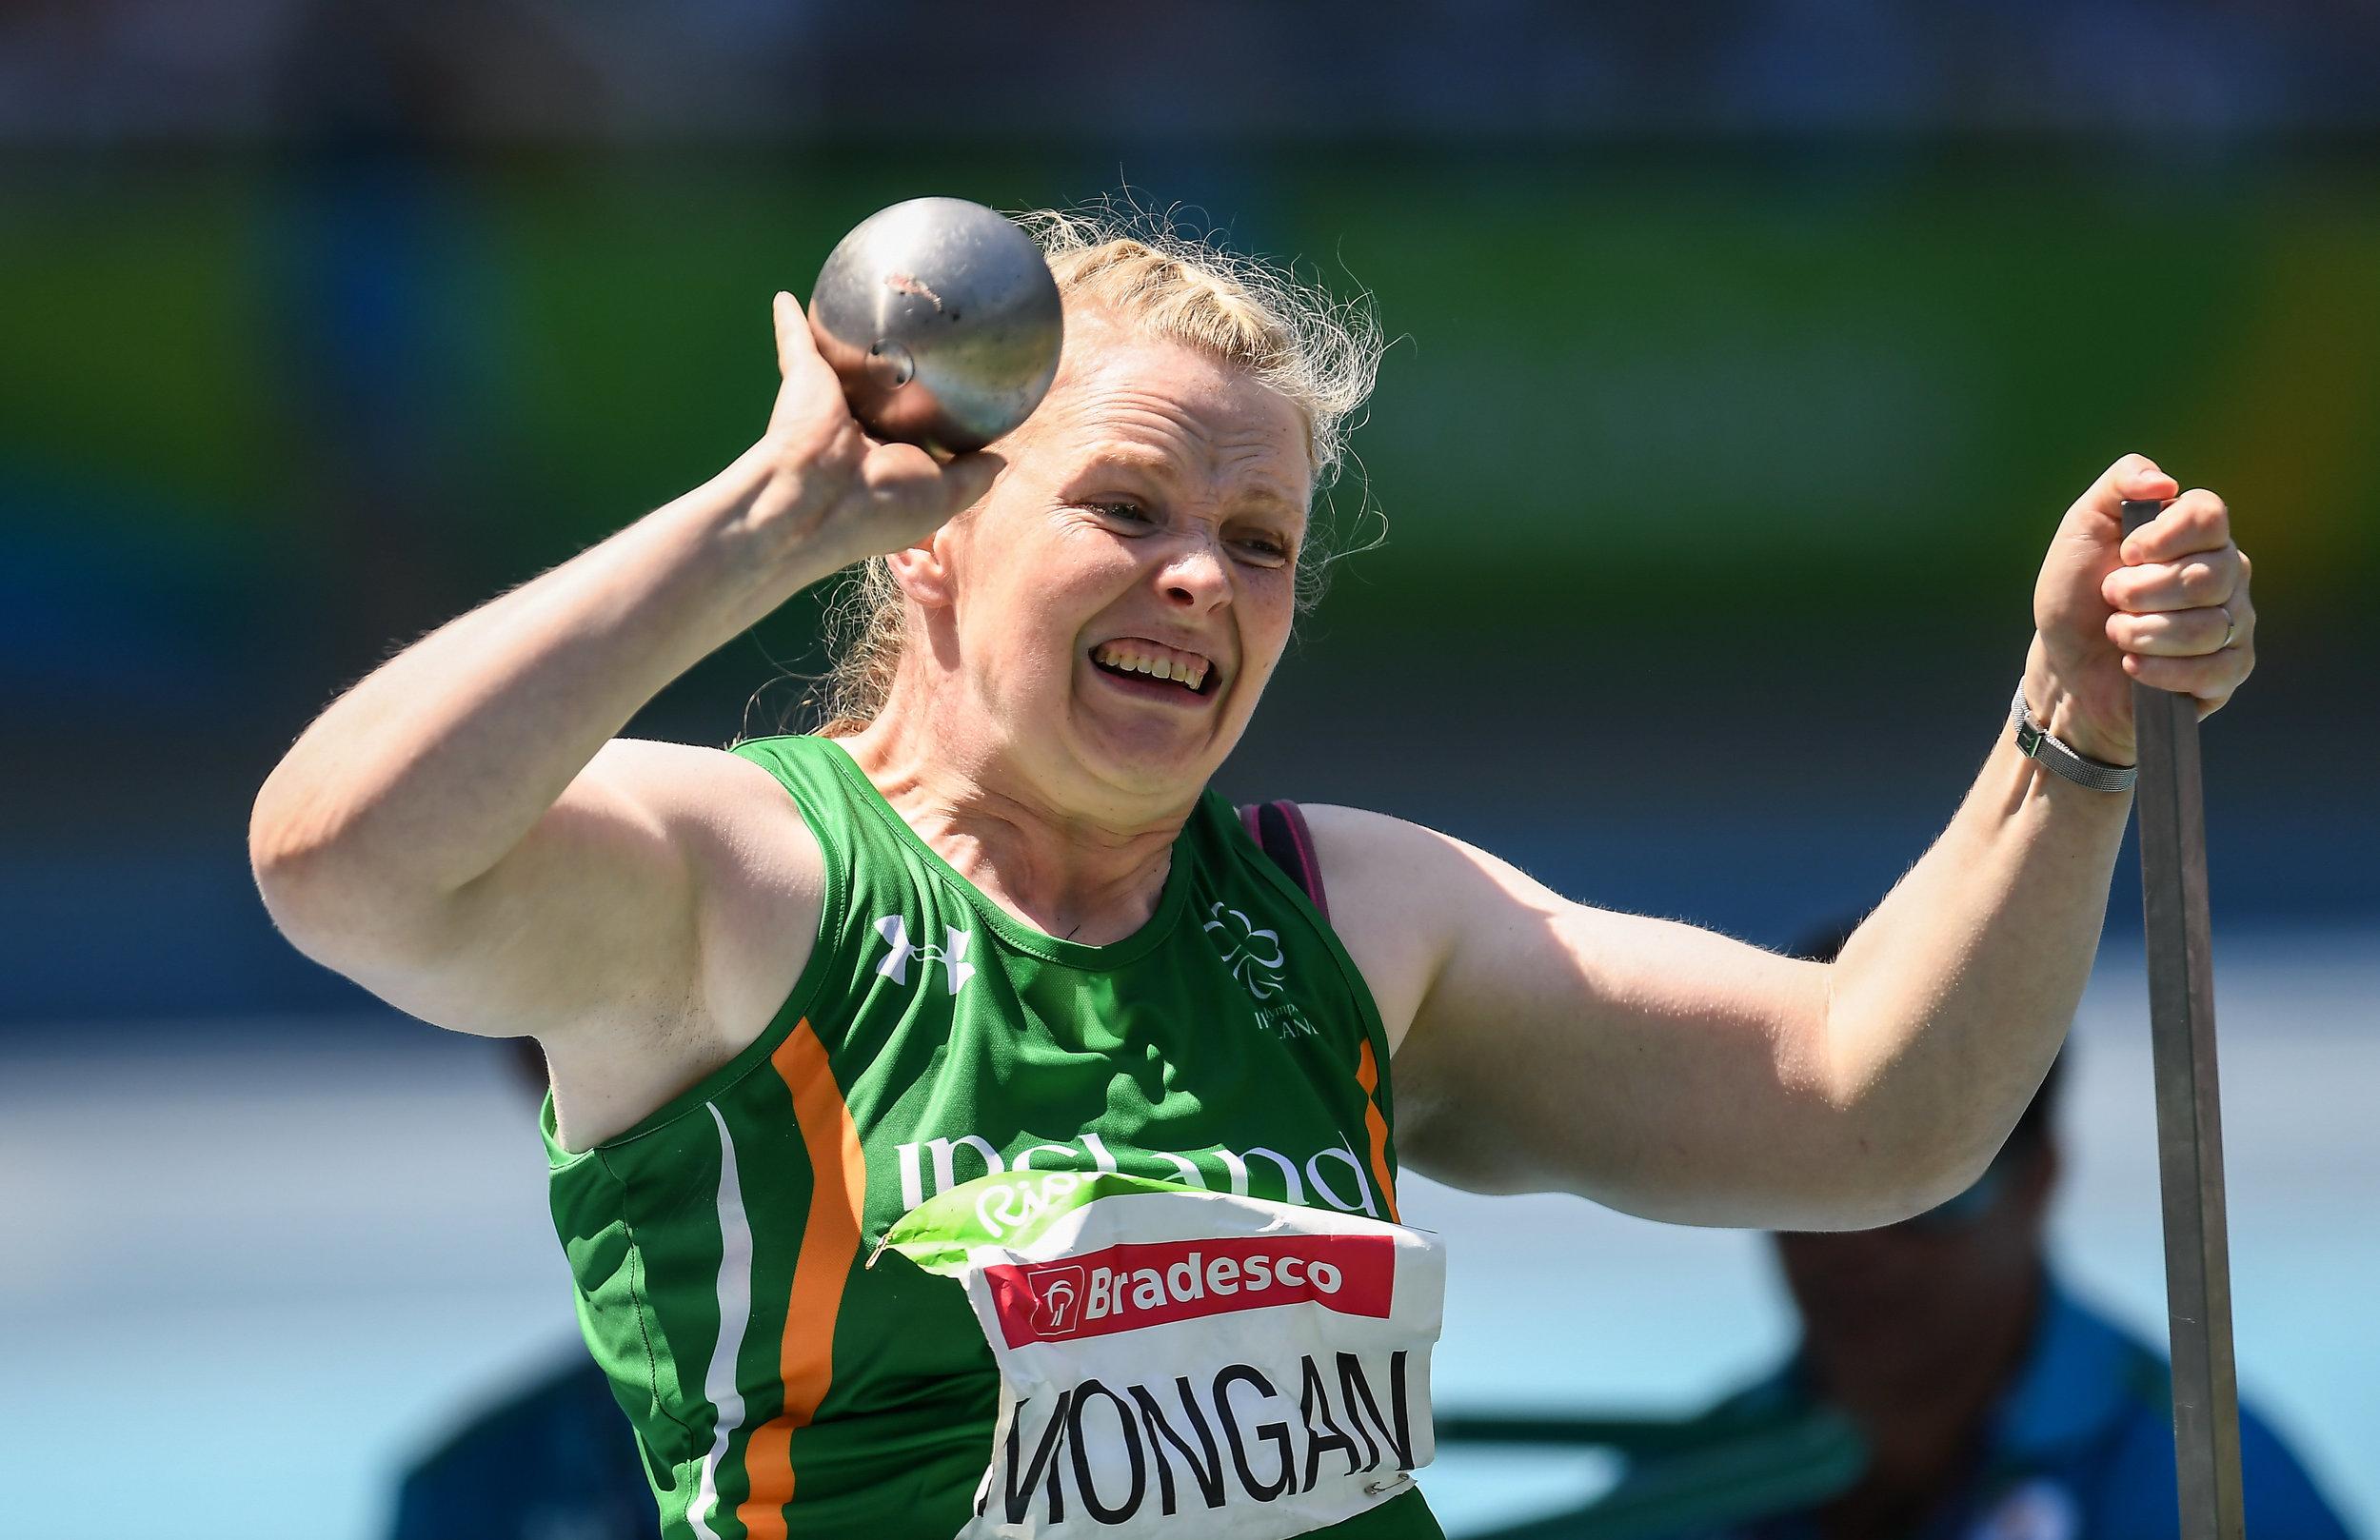 Athletics: Deirdre Mongan F53 Shot Put Final